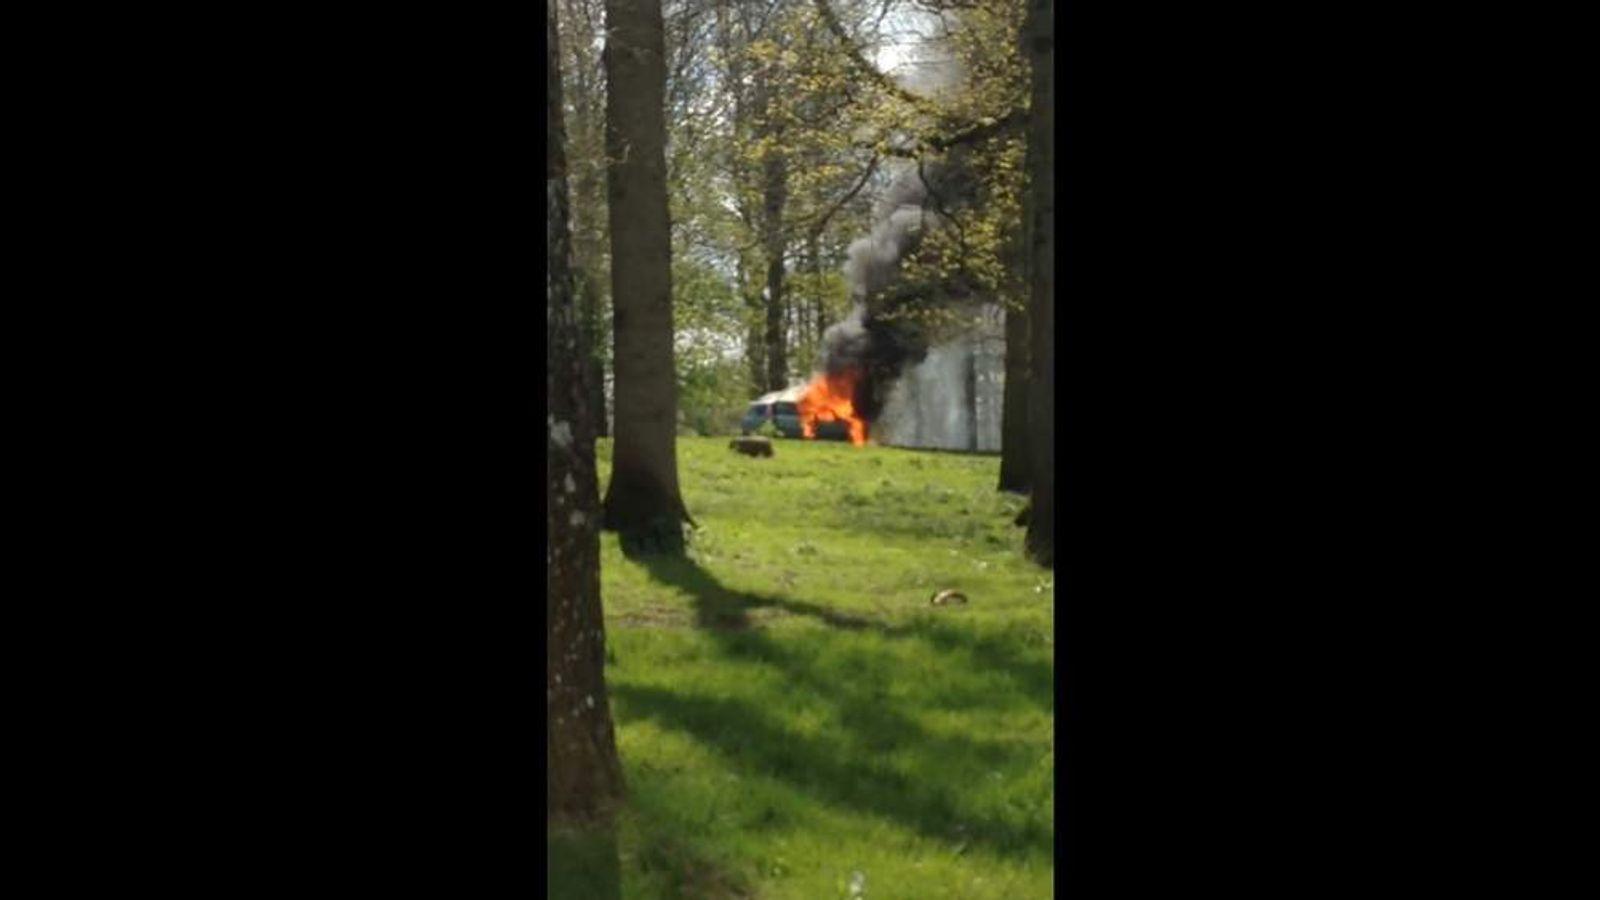 Car fire in lion enclosure